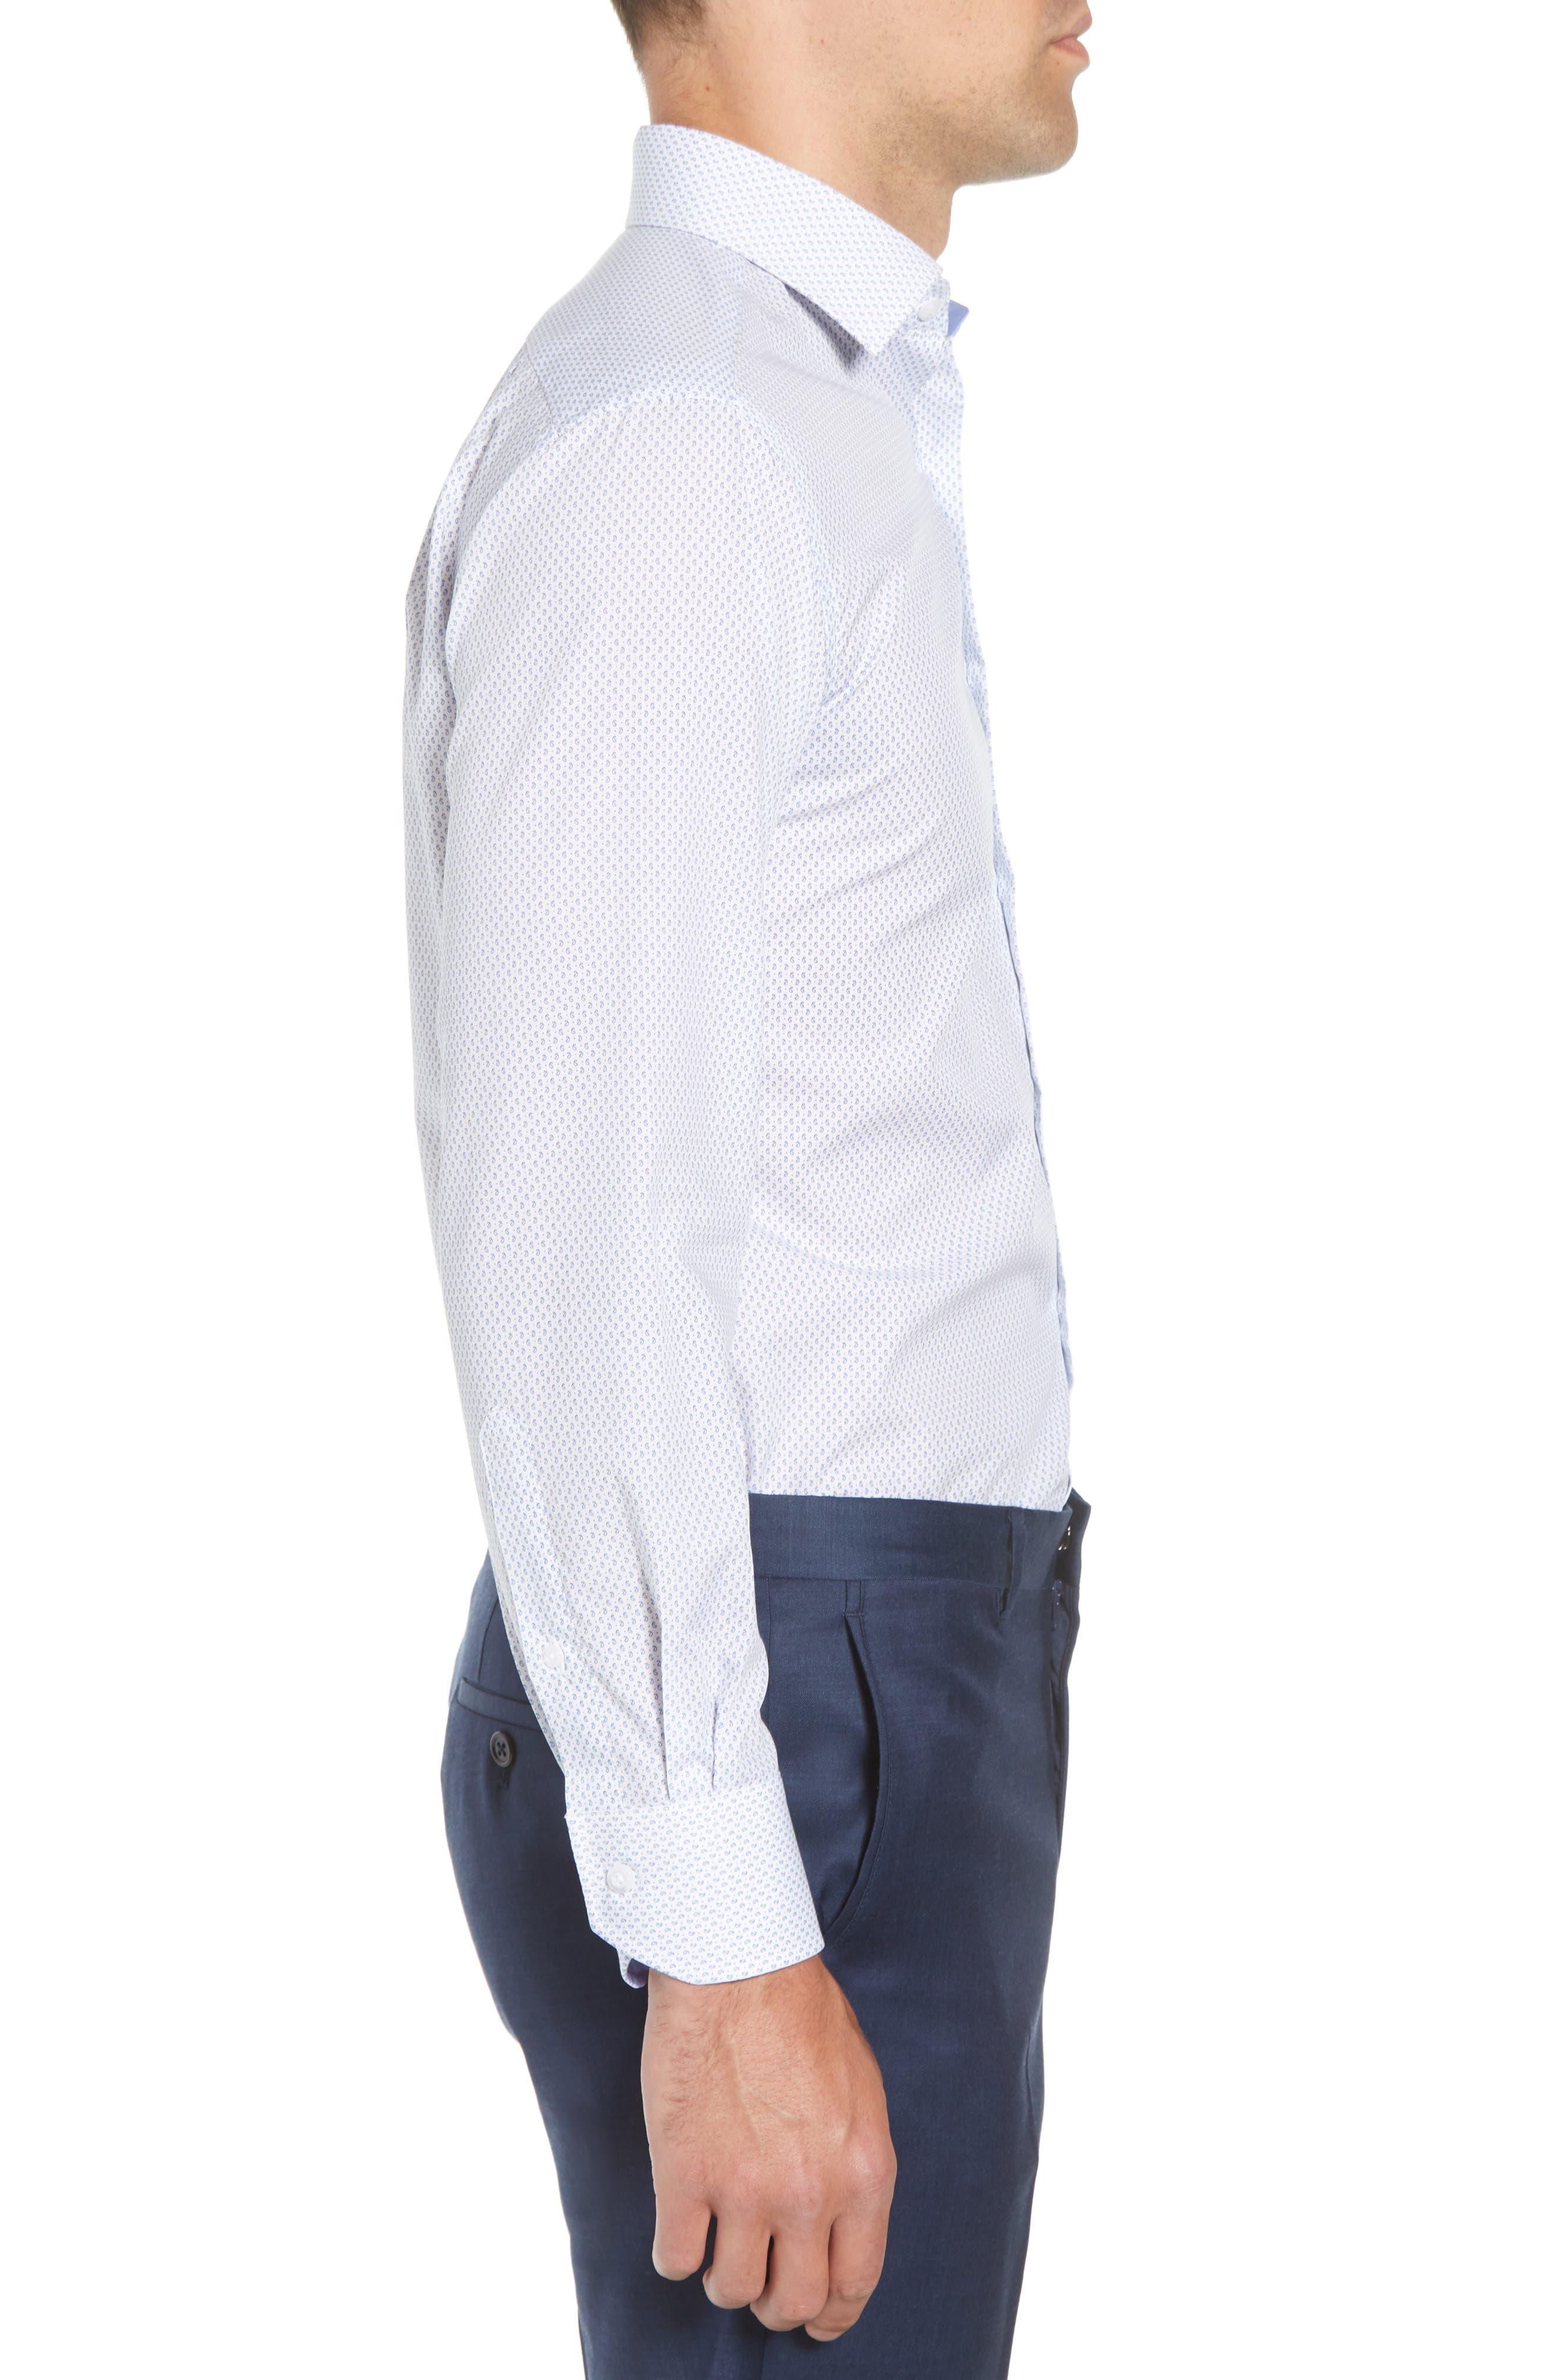 LORENZO UOMO,                             Trim Fit Paisley Dress Shirt,                             Alternate thumbnail 4, color,                             400